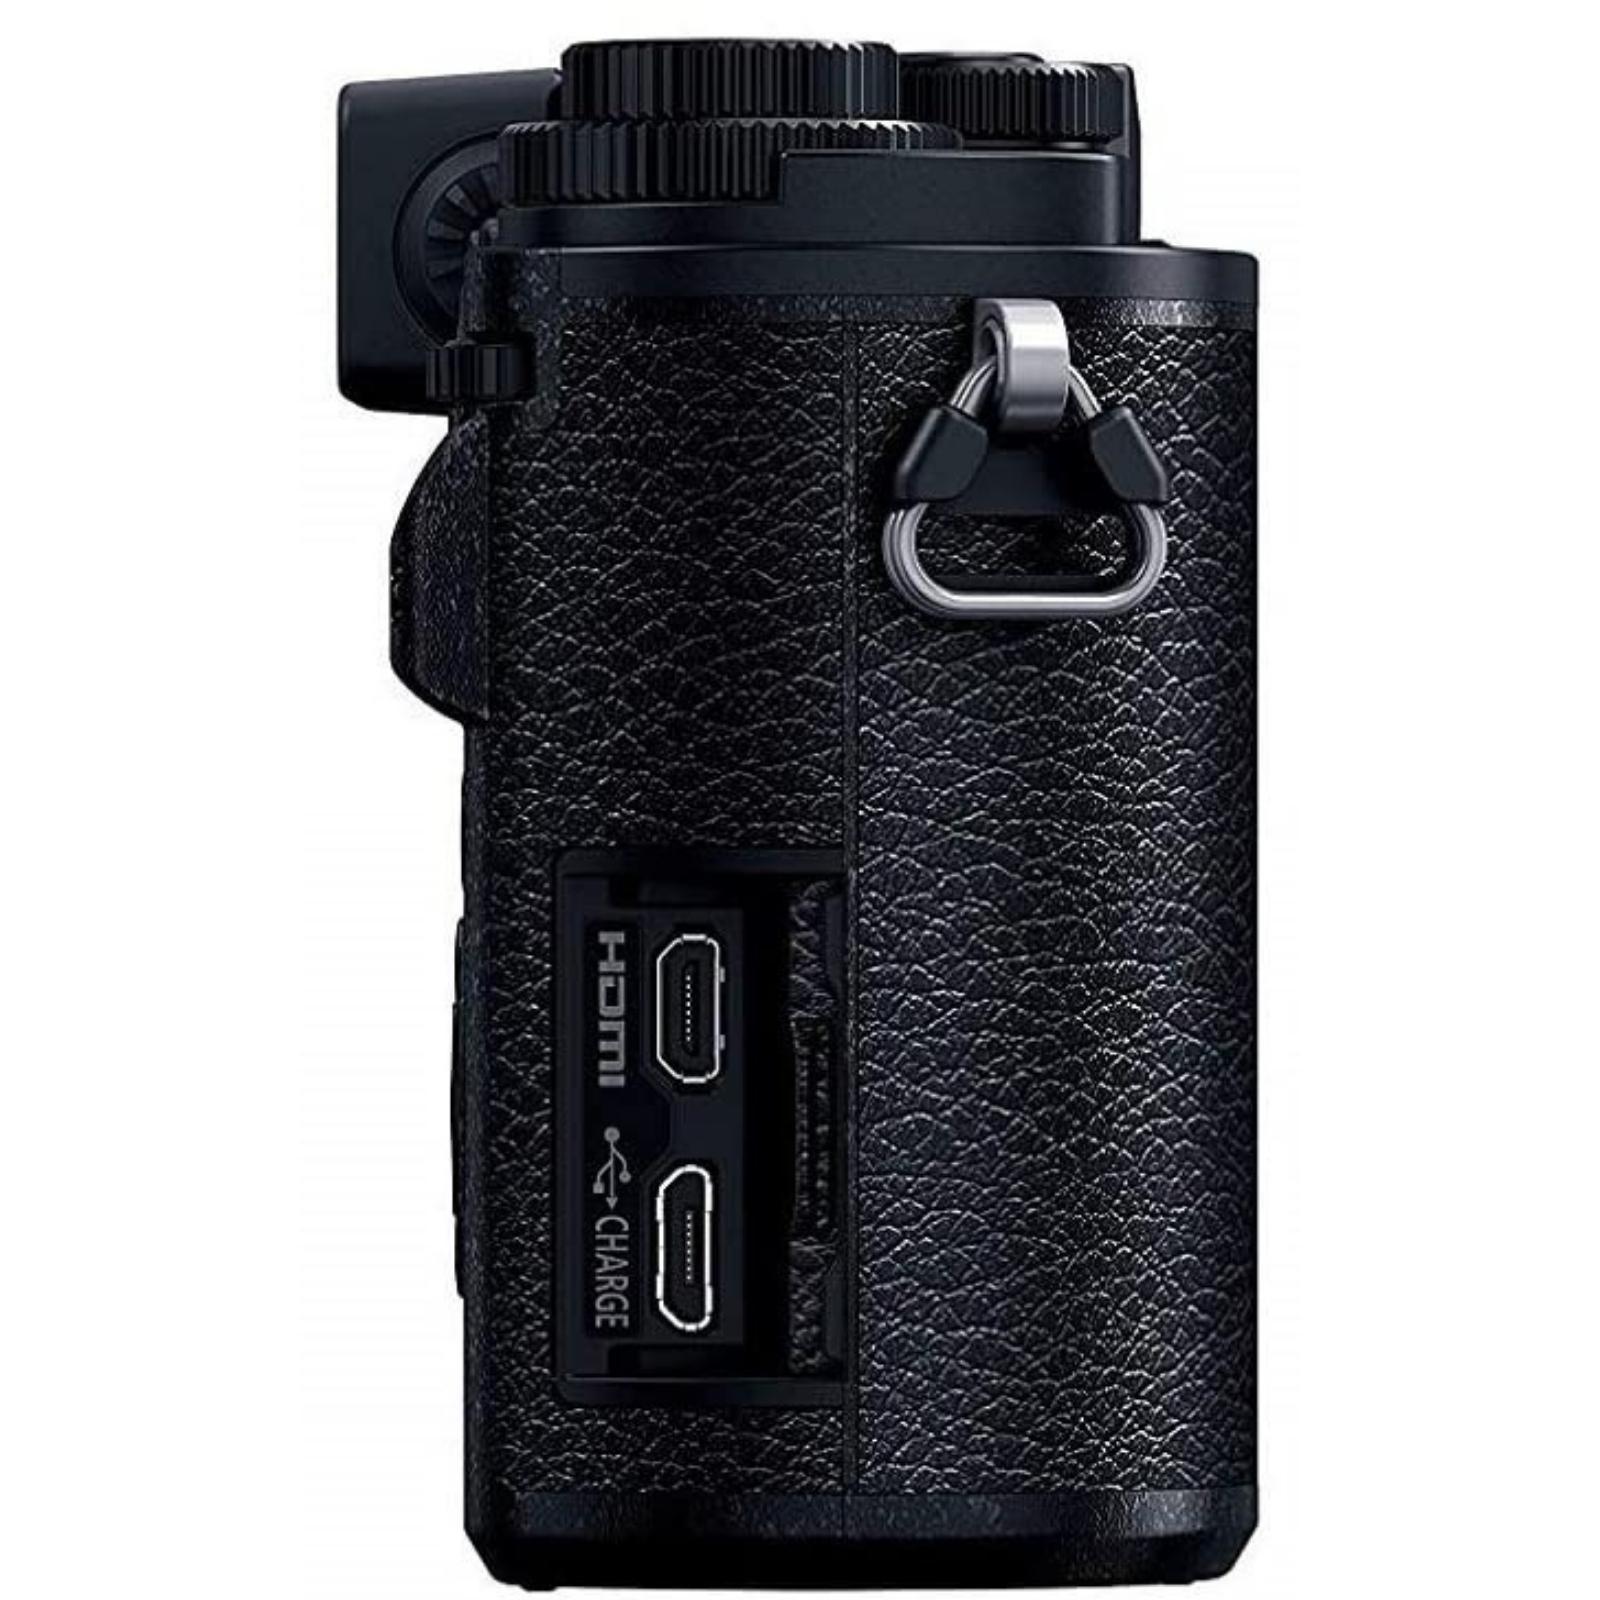 Panasonic パナソニック ミラーレス一眼カメラ GX7MK3 ボディ ブラック DC-GX7MK3-K 新品